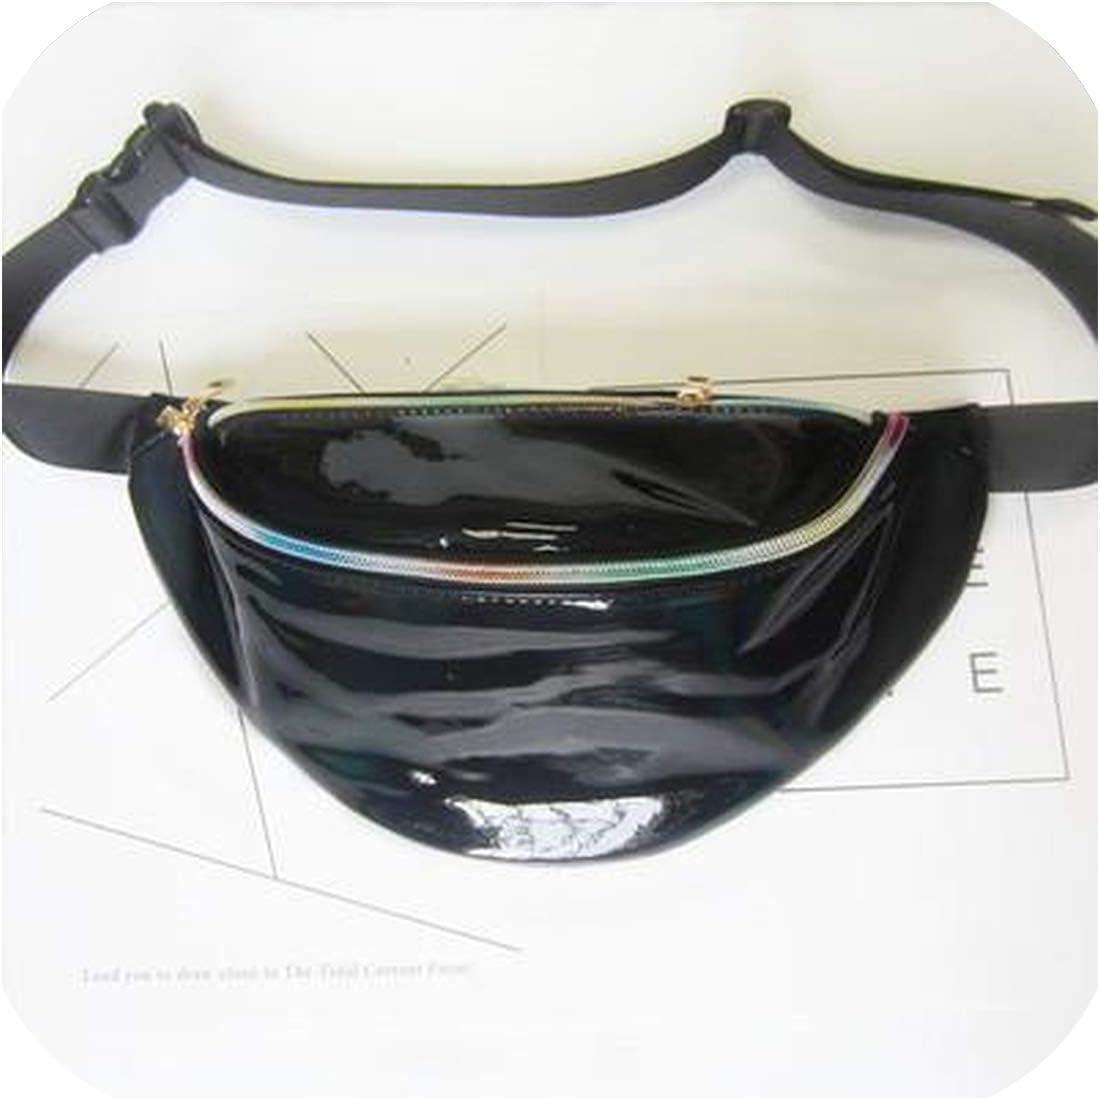 Fanny Pack transparent Waist Bag hologram bag Belt Bag Waist Pack Bolsa Feminina Hip Bag Belt Pouc,lan se